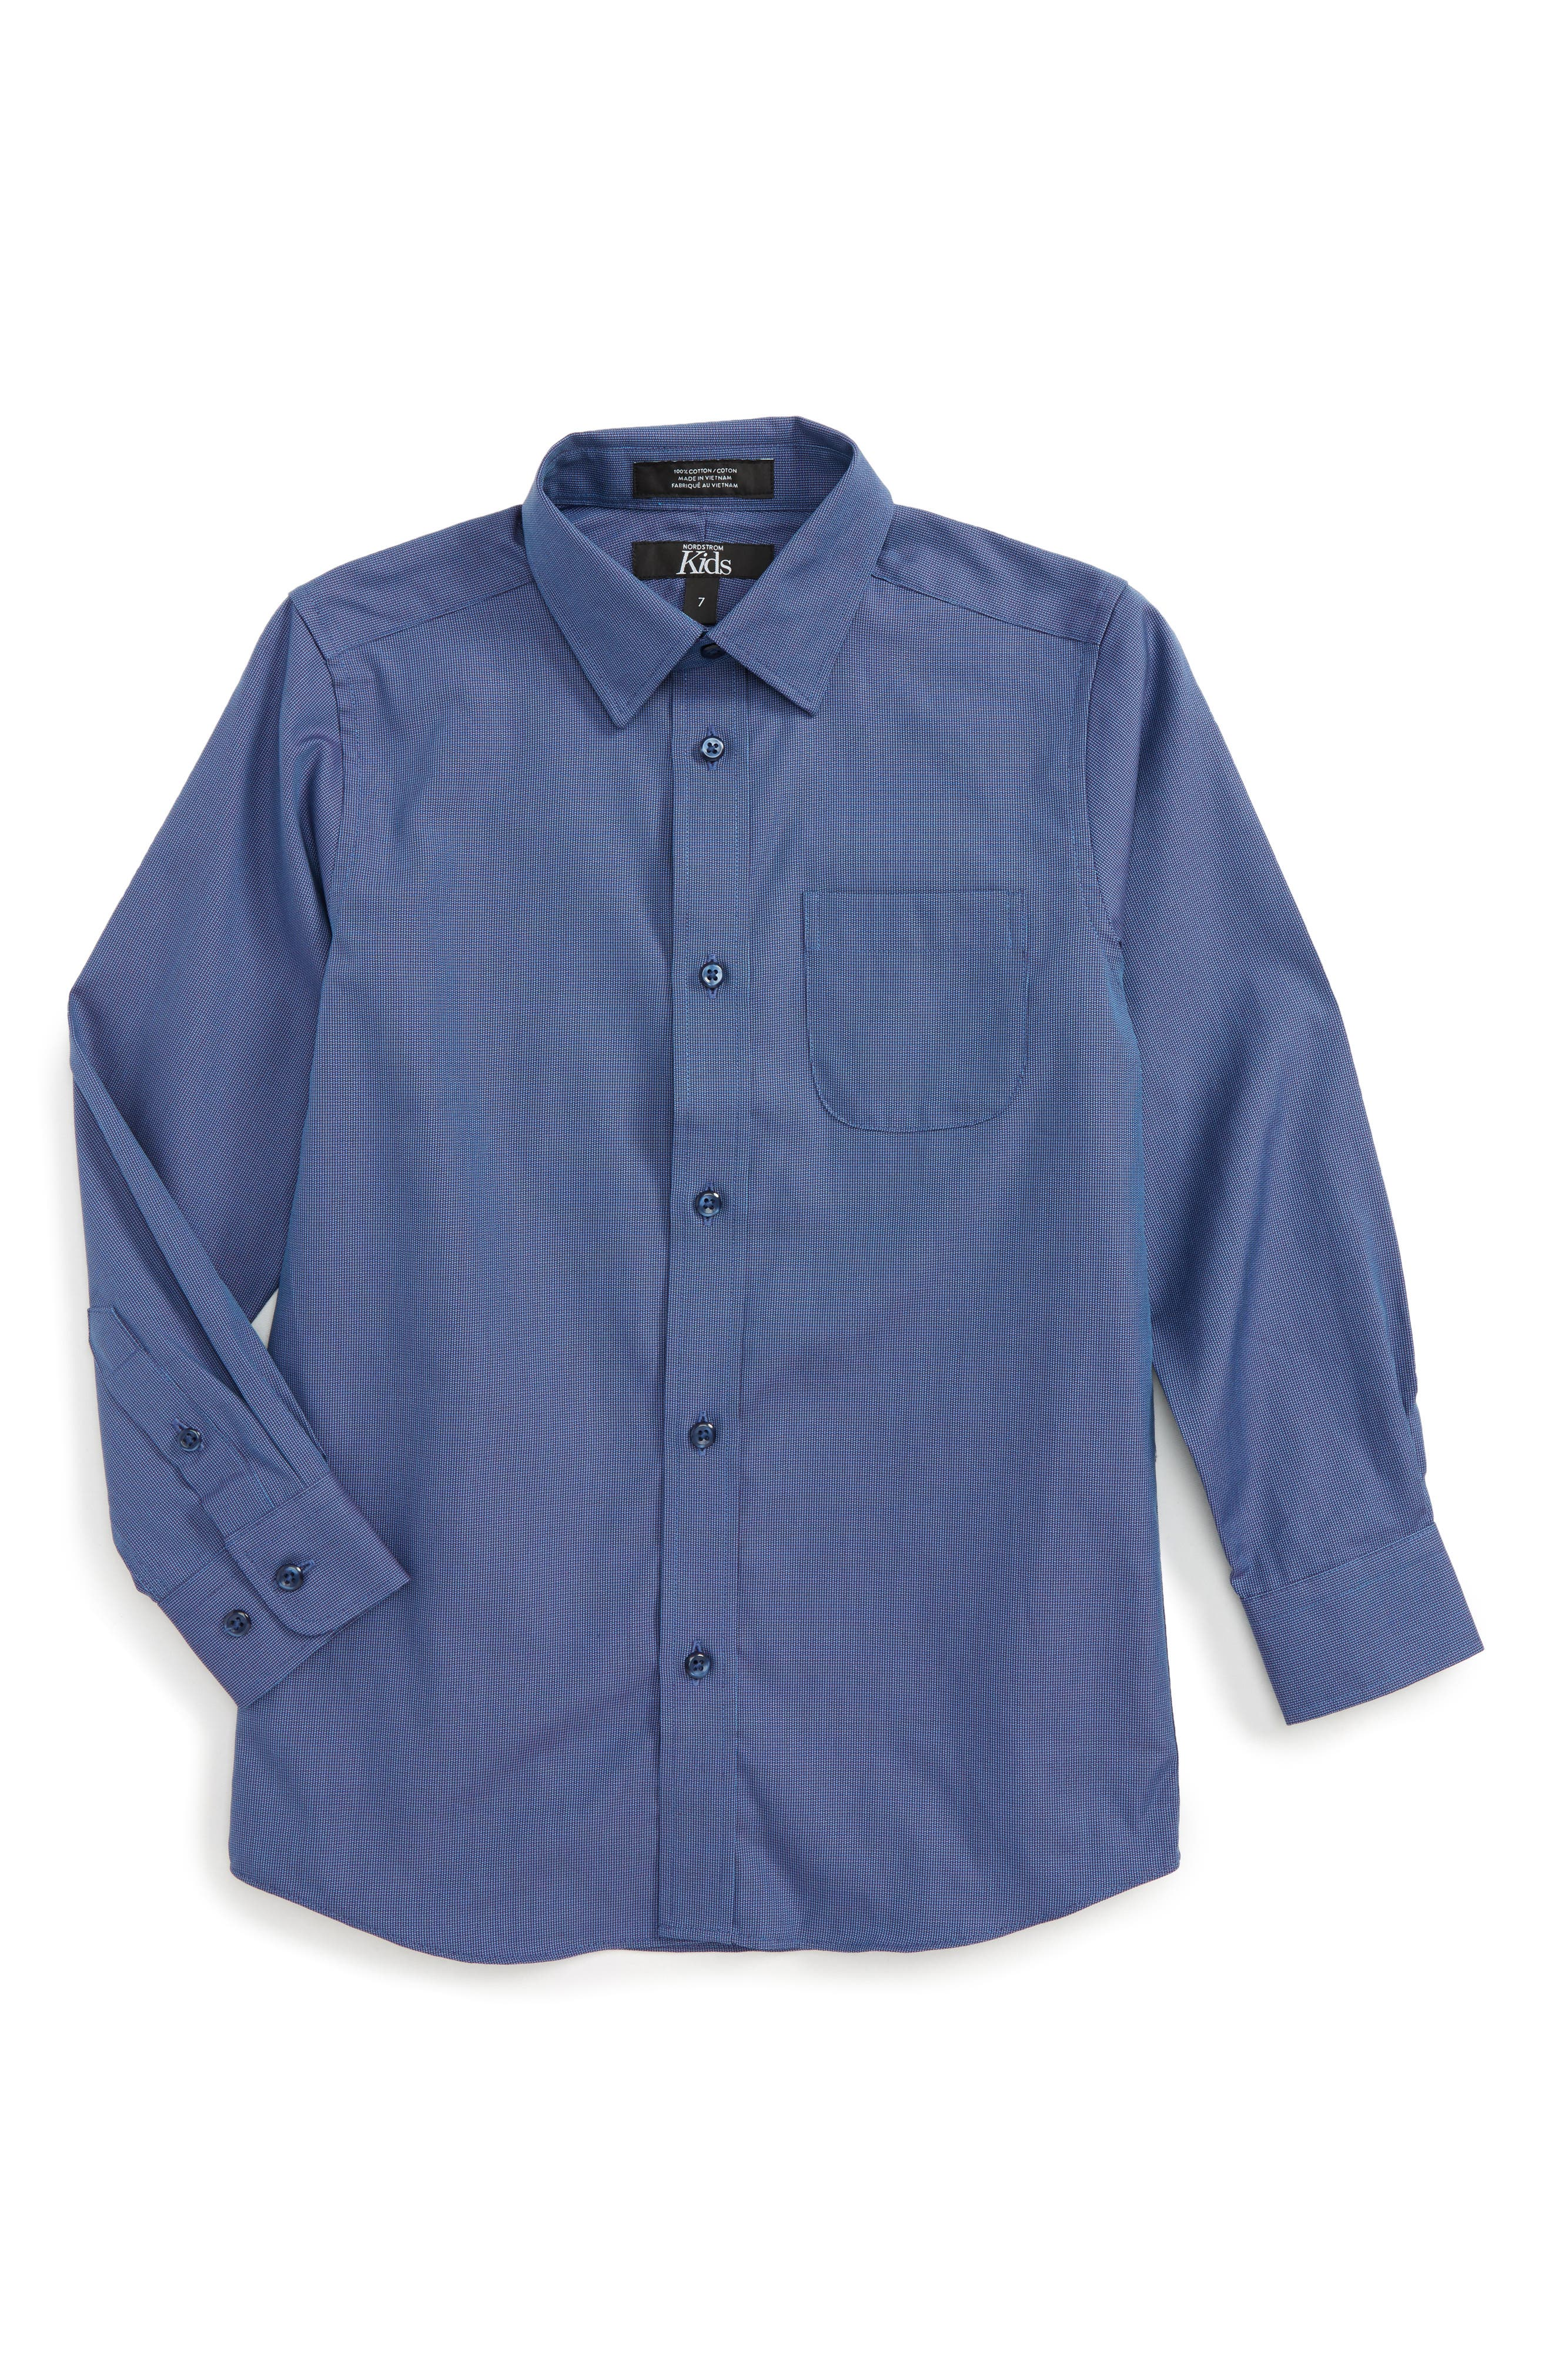 Patriot Cotton Poplin Dress Shirt,                         Main,                         color, Navy Patriot